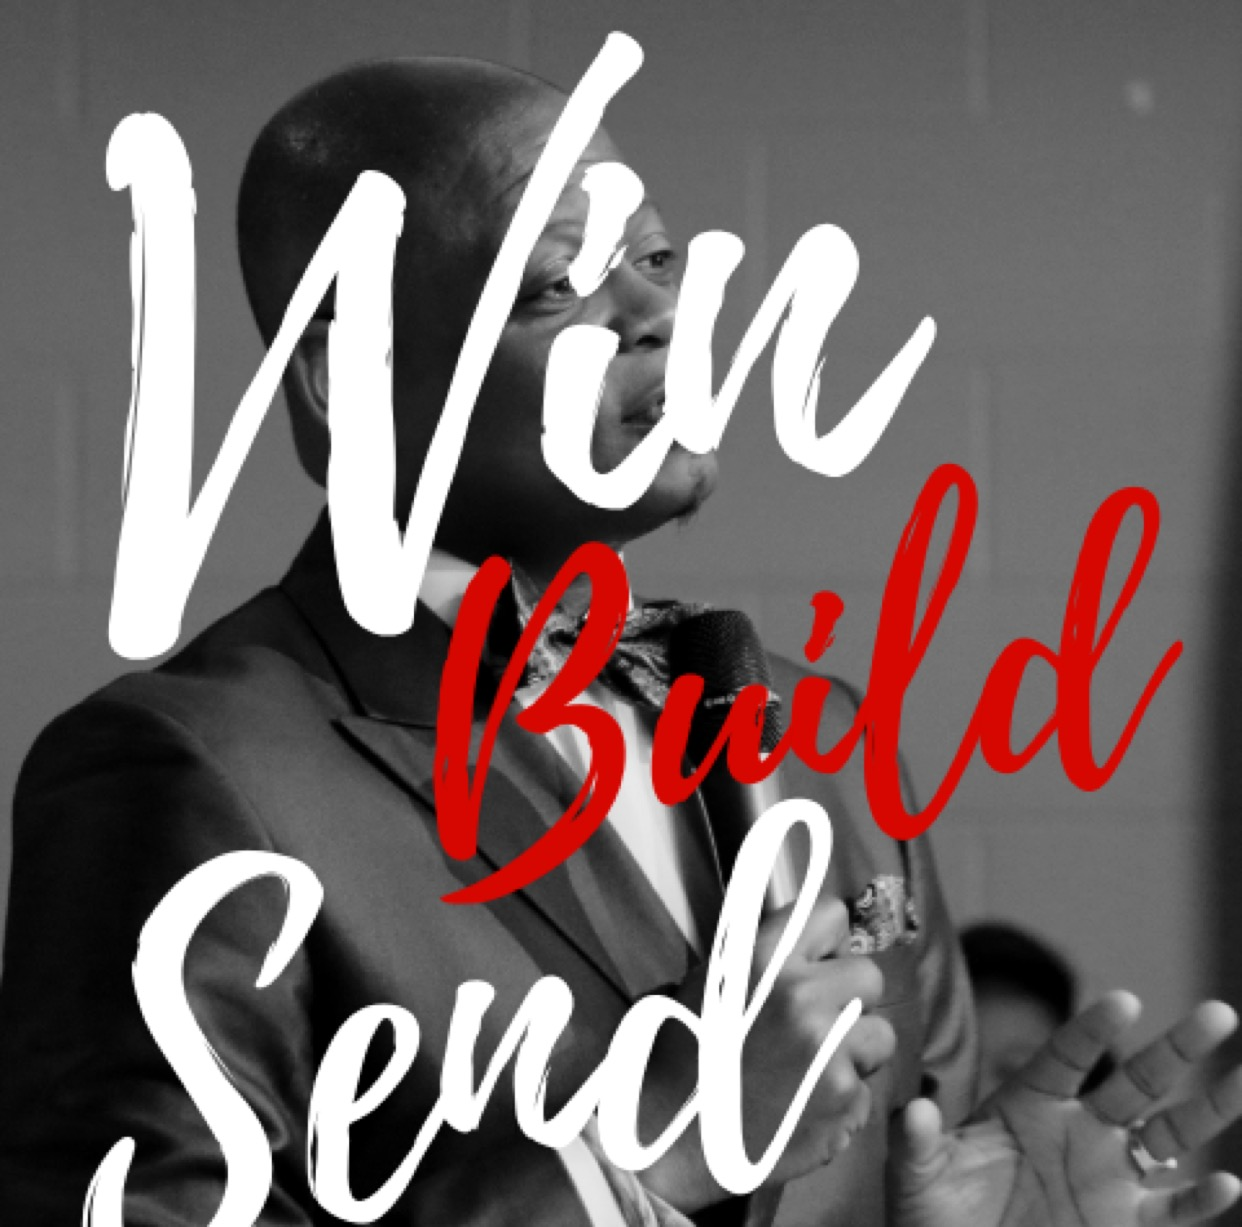 Win the soul 👏🏾 Build